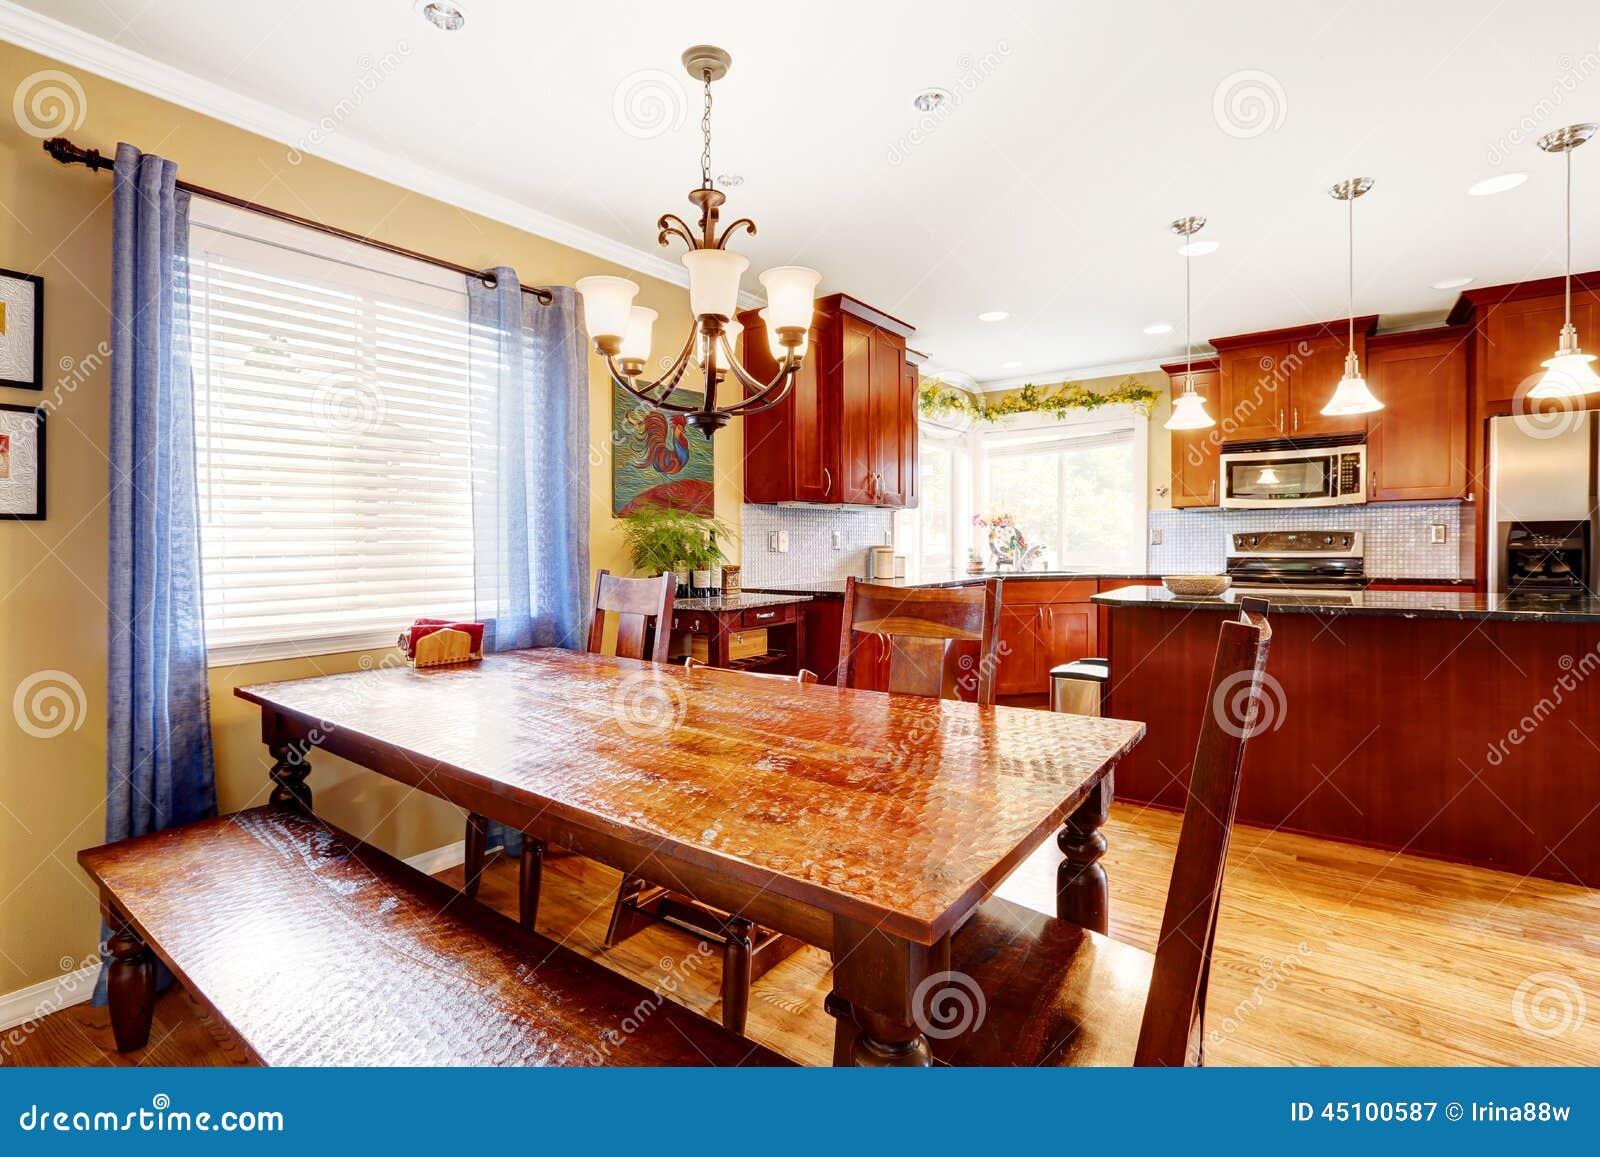 Mesa de jantar com banco e cadeiras na sala da cozinha for Banquette de salle a manger